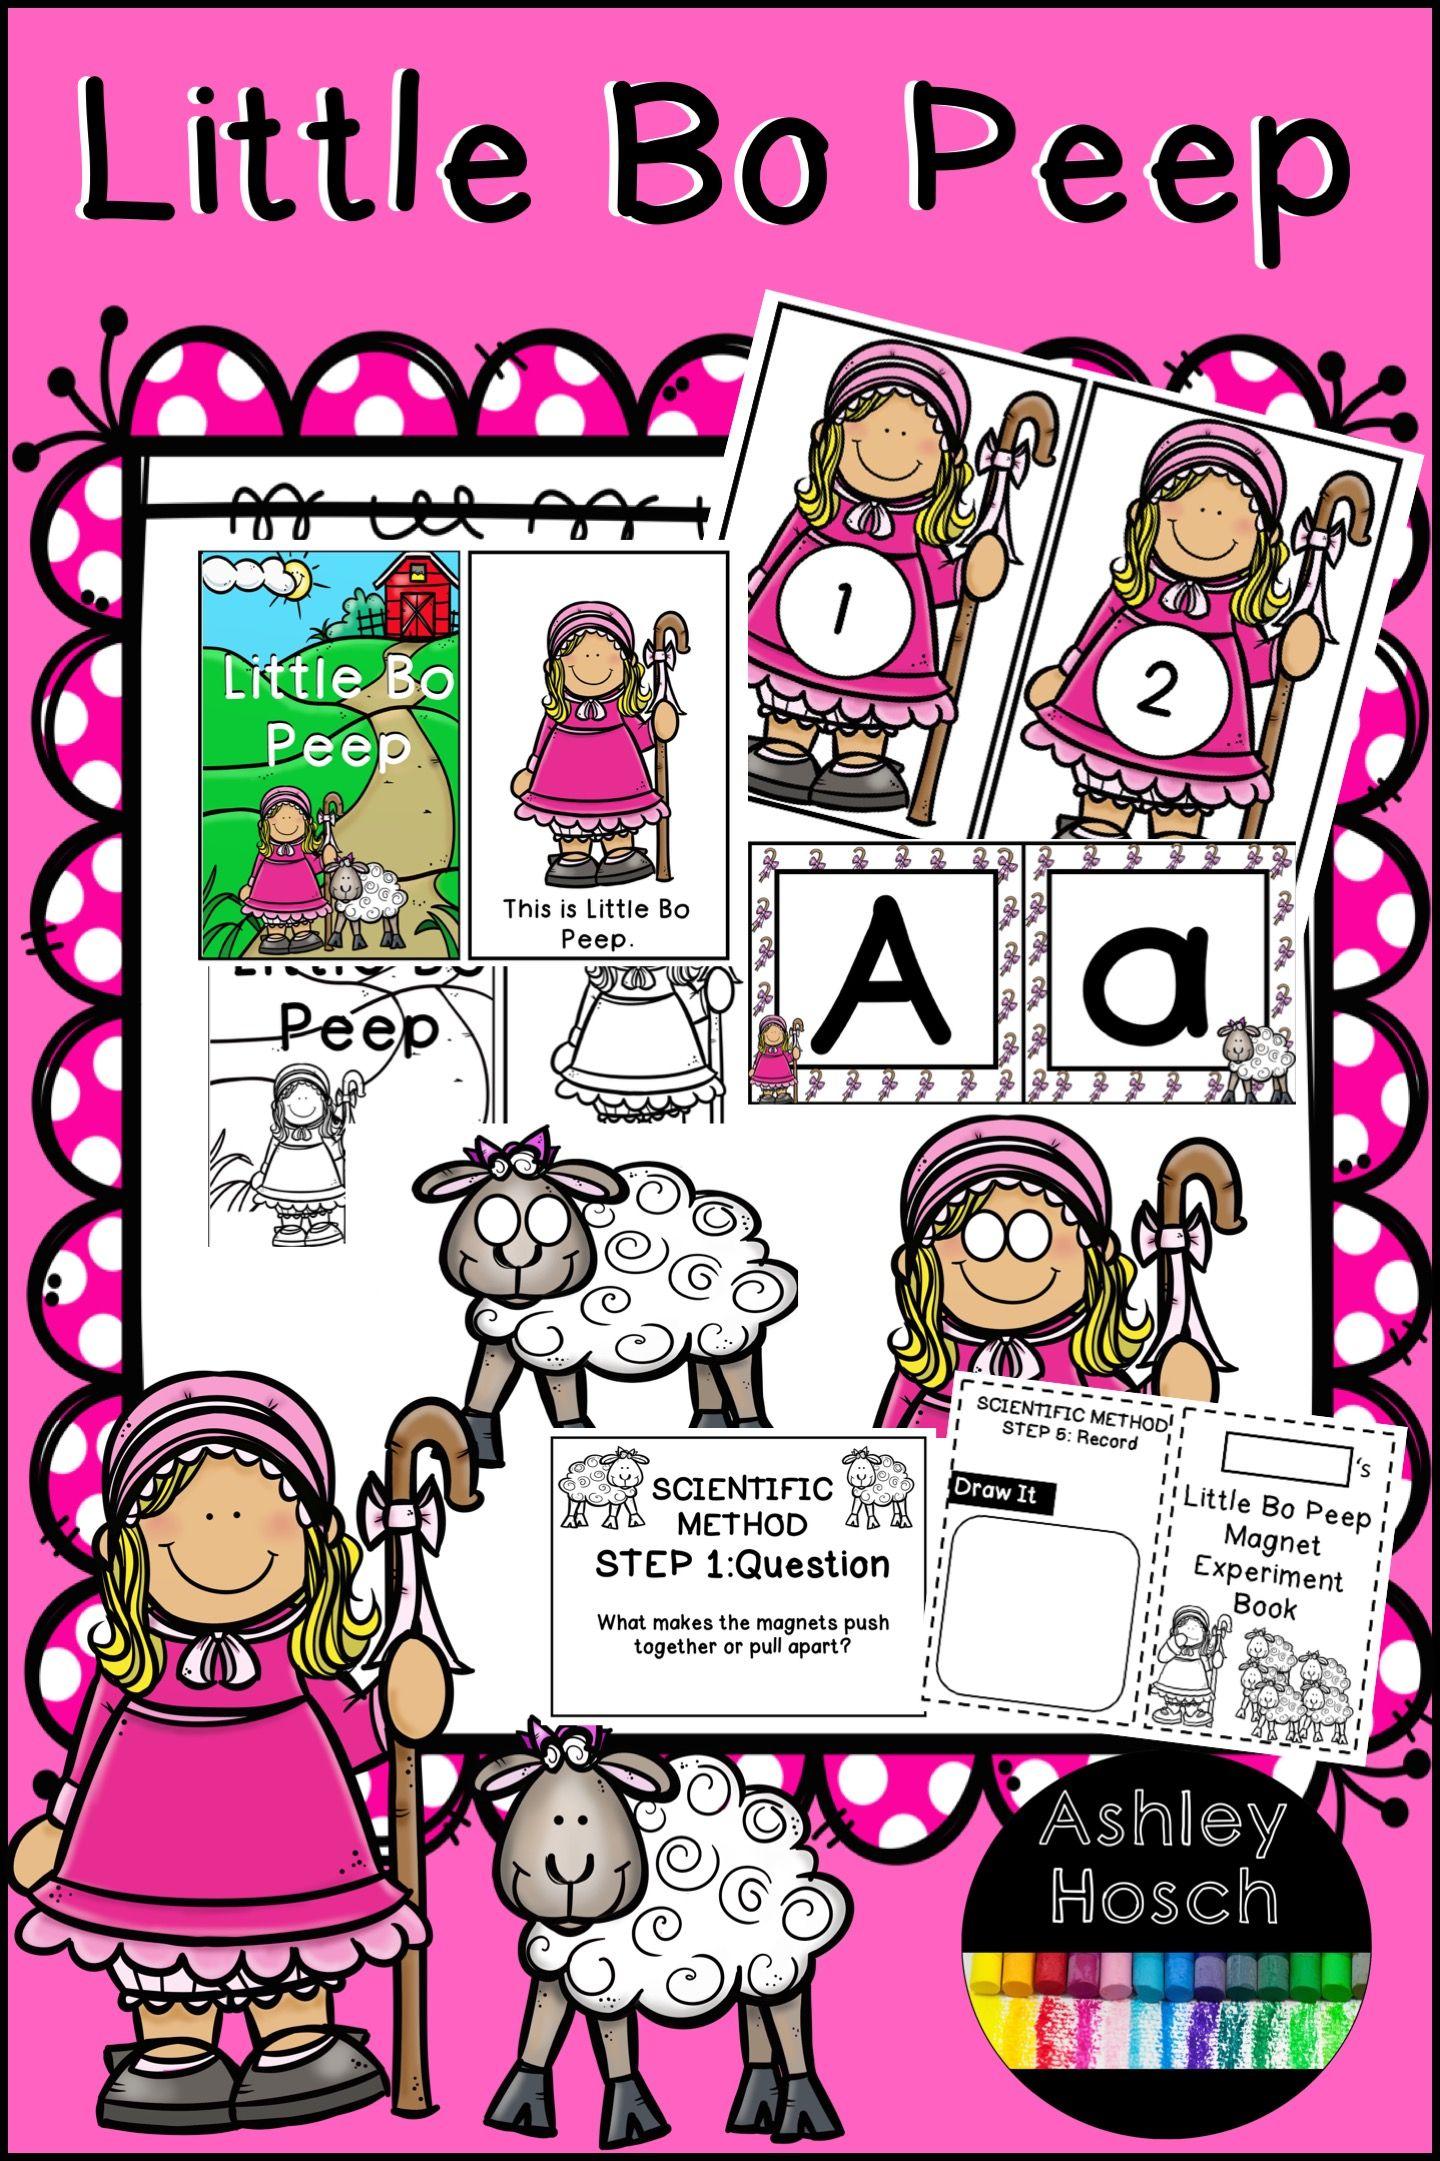 Little Bo Peep Nursery Rhyme Thematic Unit For Preschool